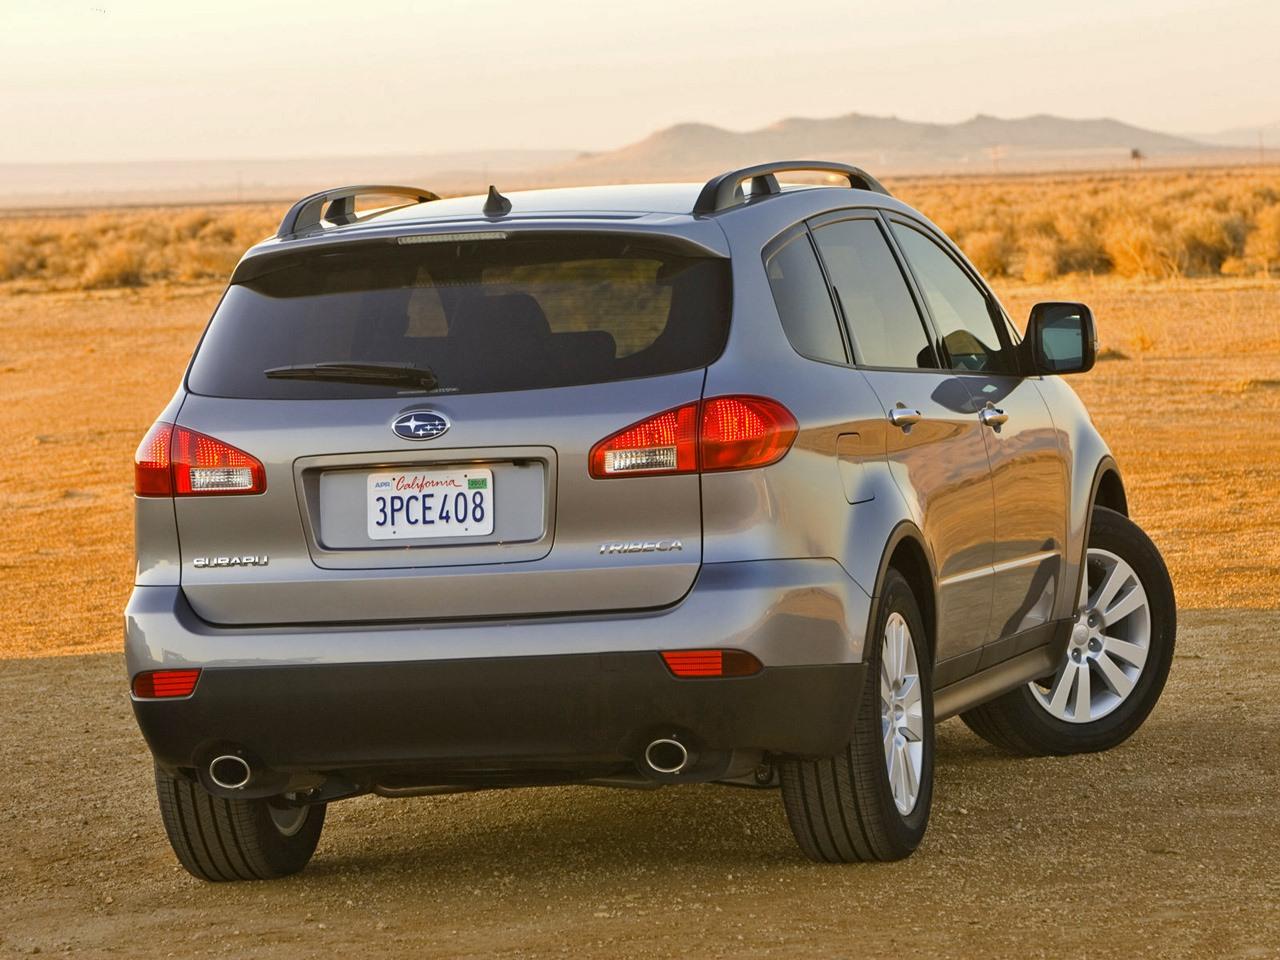 Subaru Tribeca (Субару Tribeca) 2020 - обзор модели c фото ...